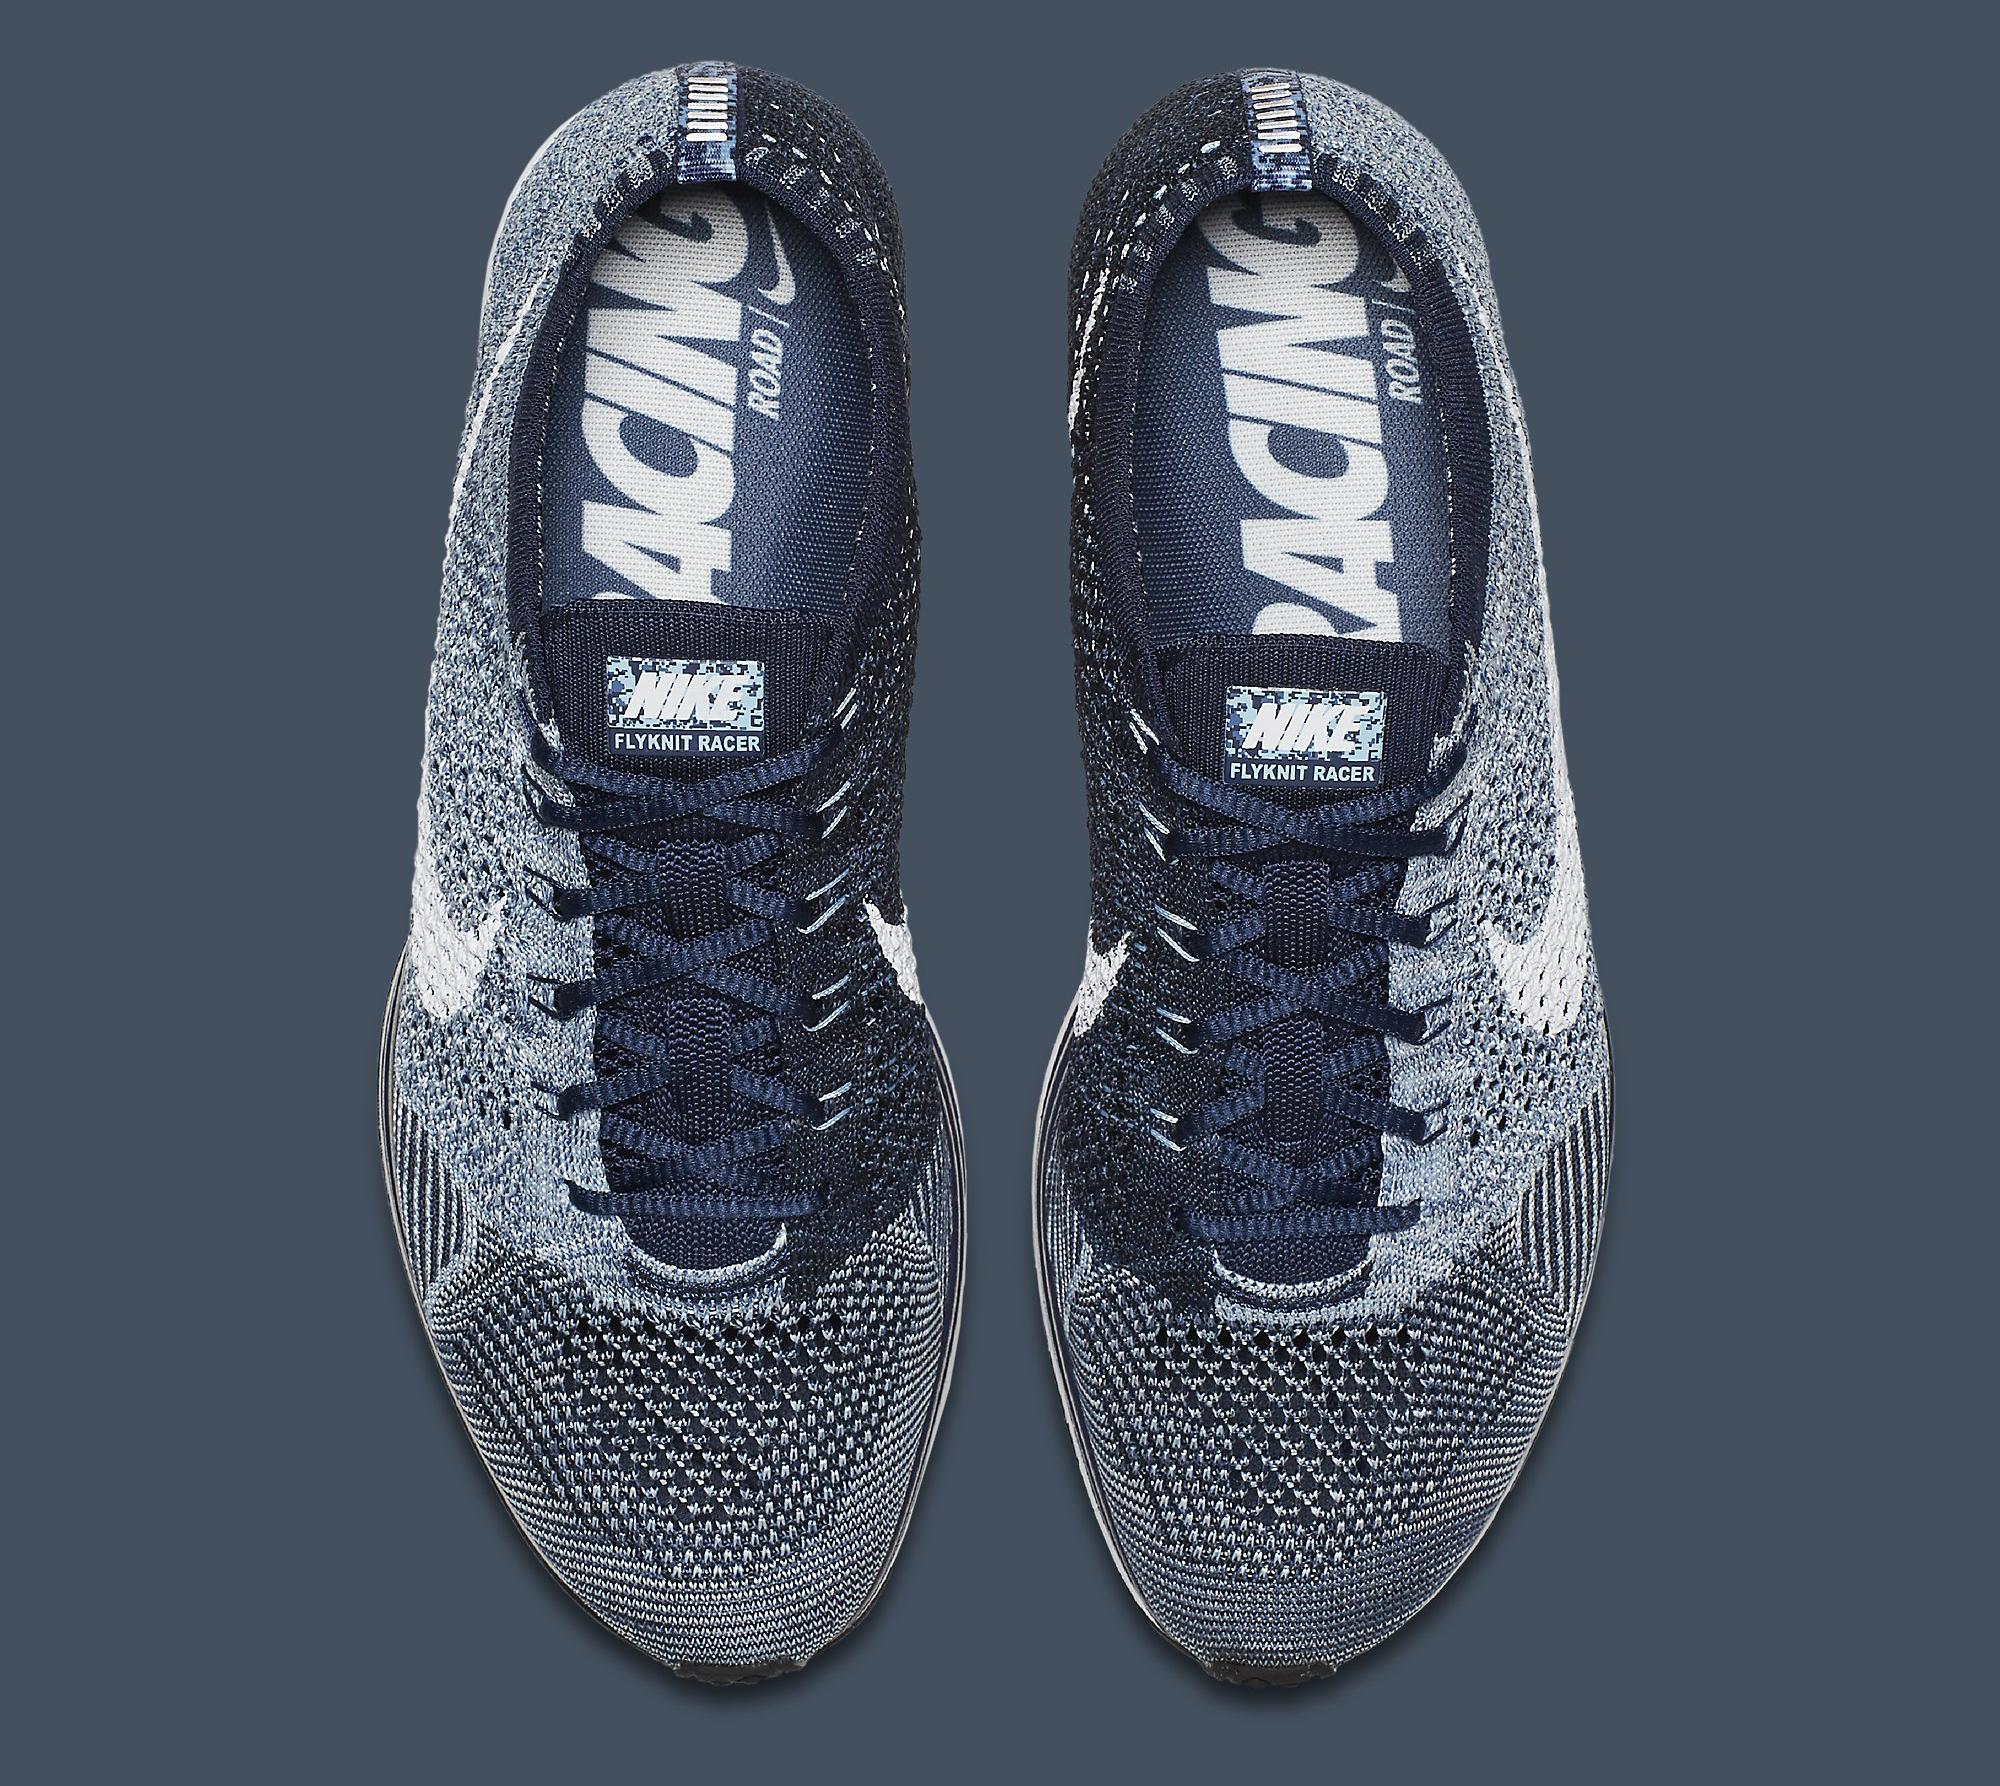 Nike Flyknit Racer Blue Tint White 862713-401 Top